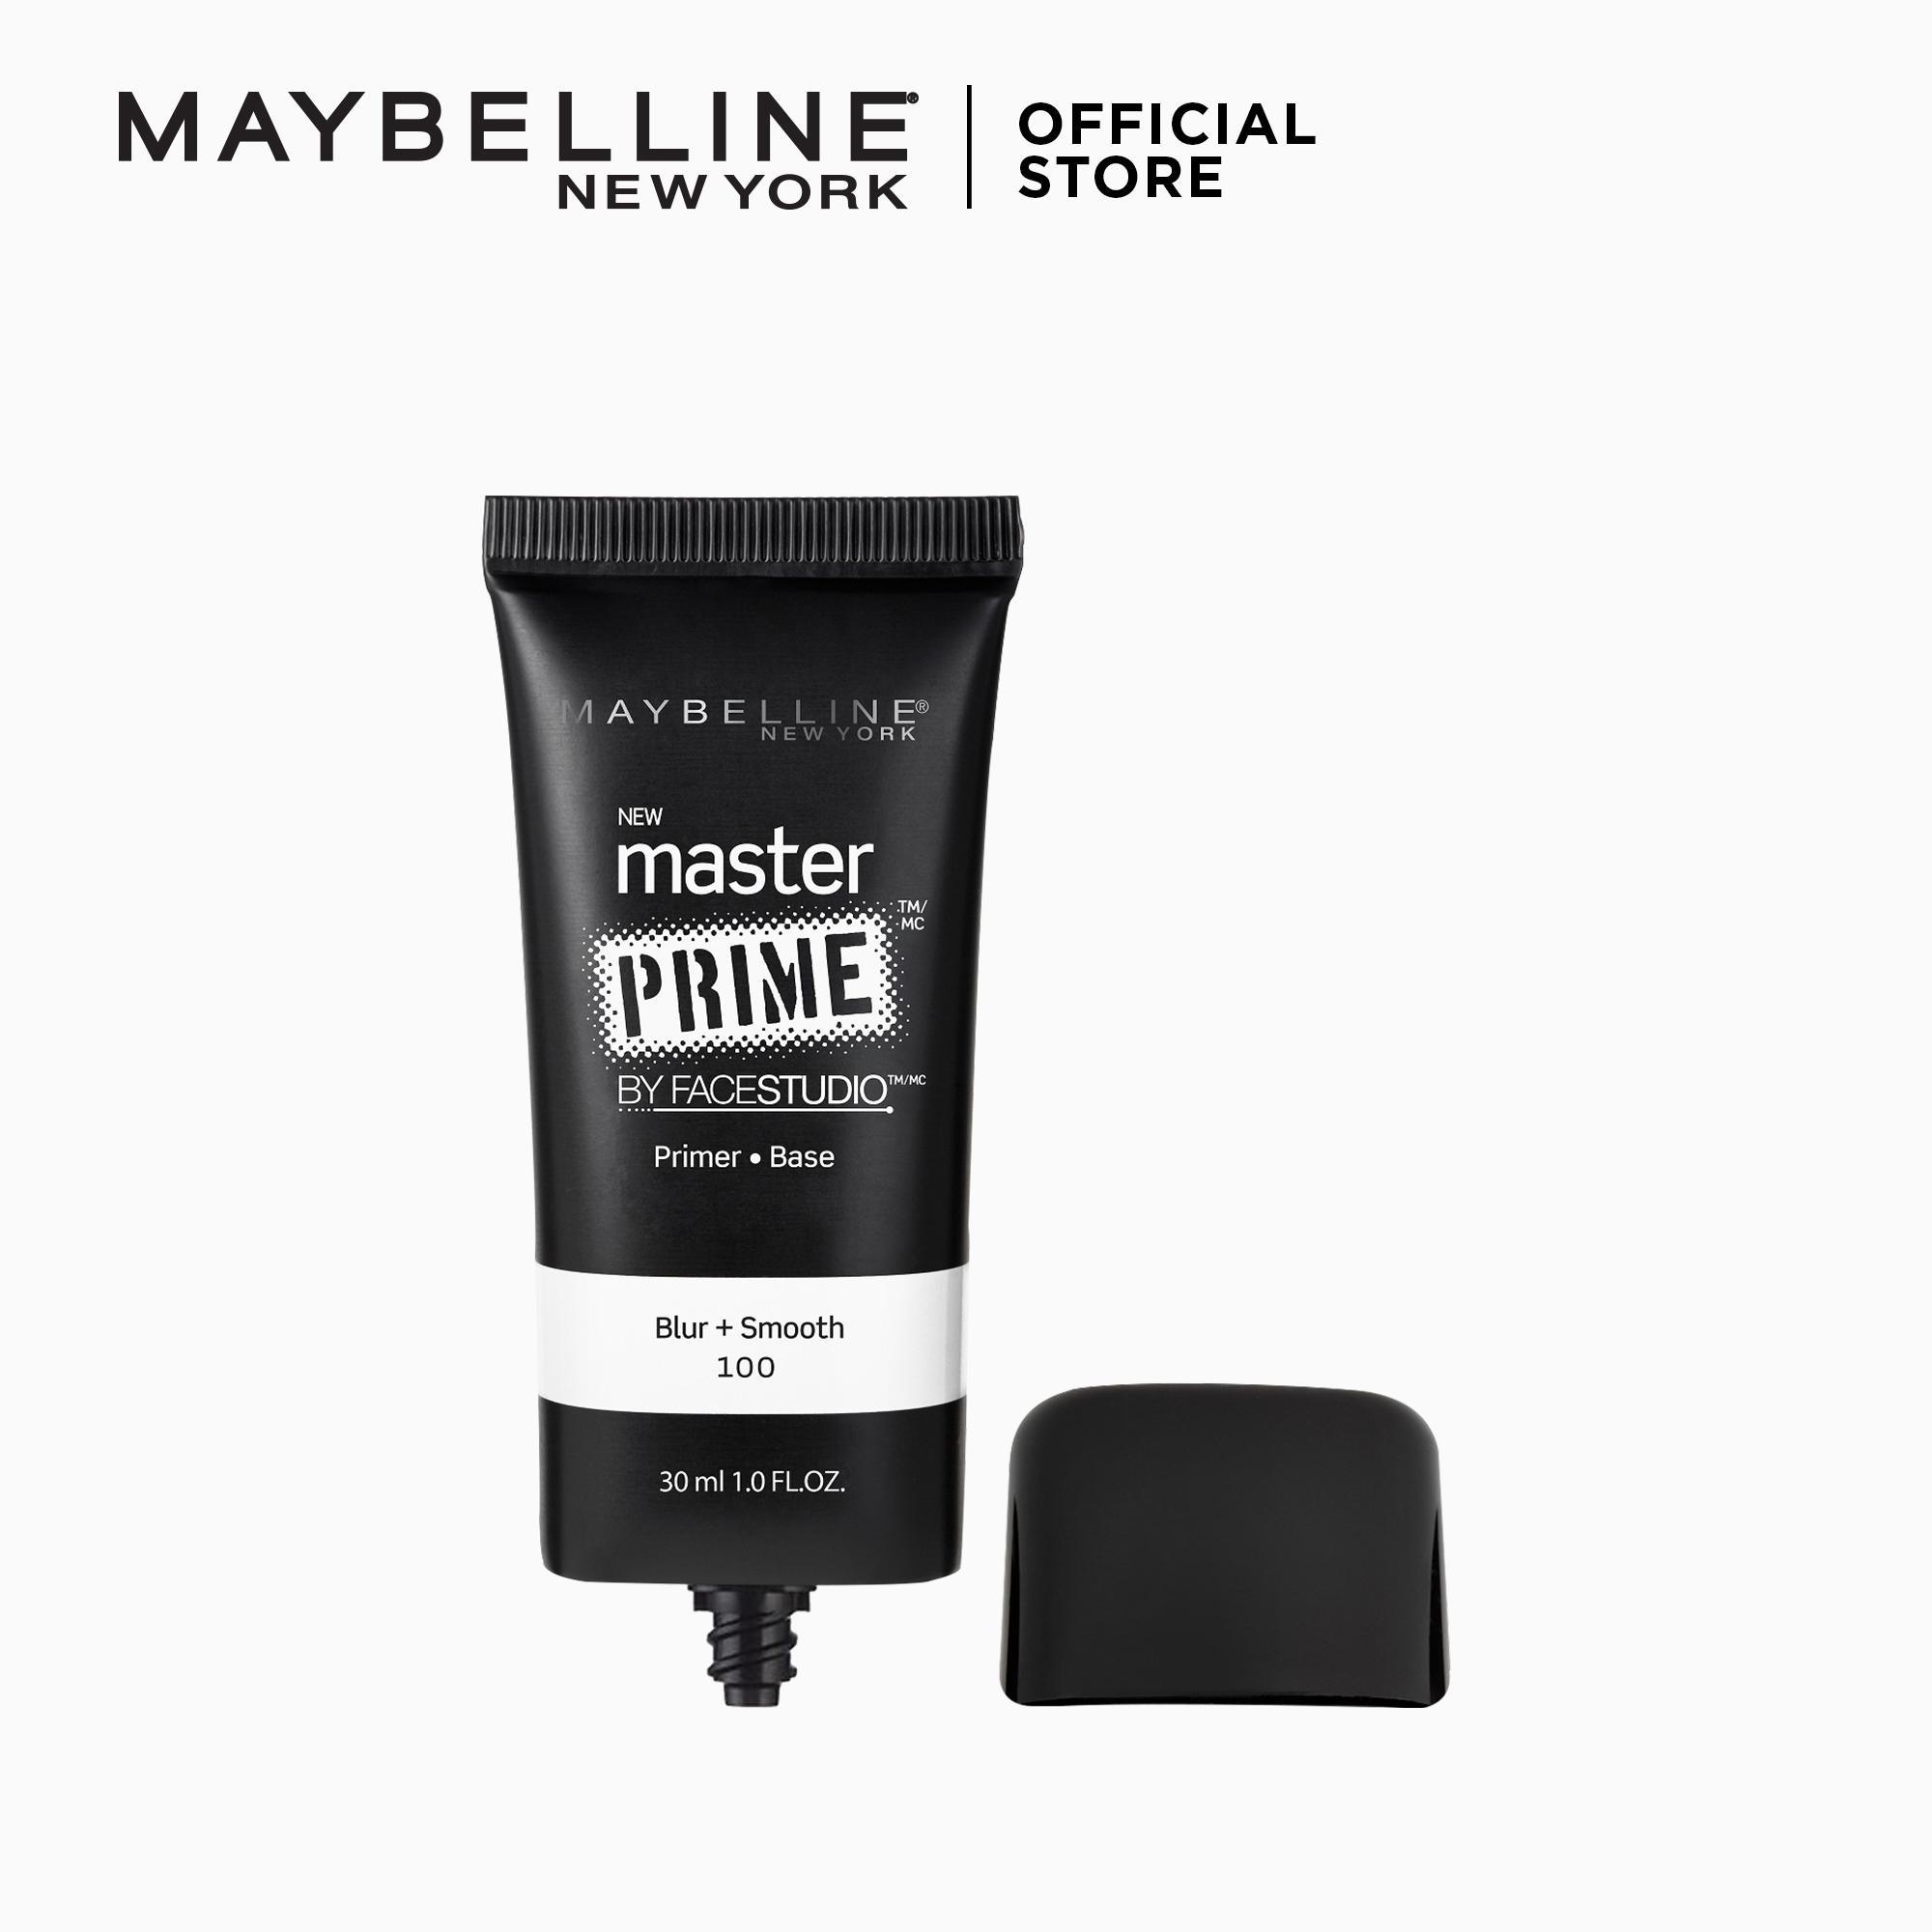 Maybelline Philippines Price List Lipstick Face Studio V Shape Powder 01 Light Med Master Prime Mattifying Primer Base By